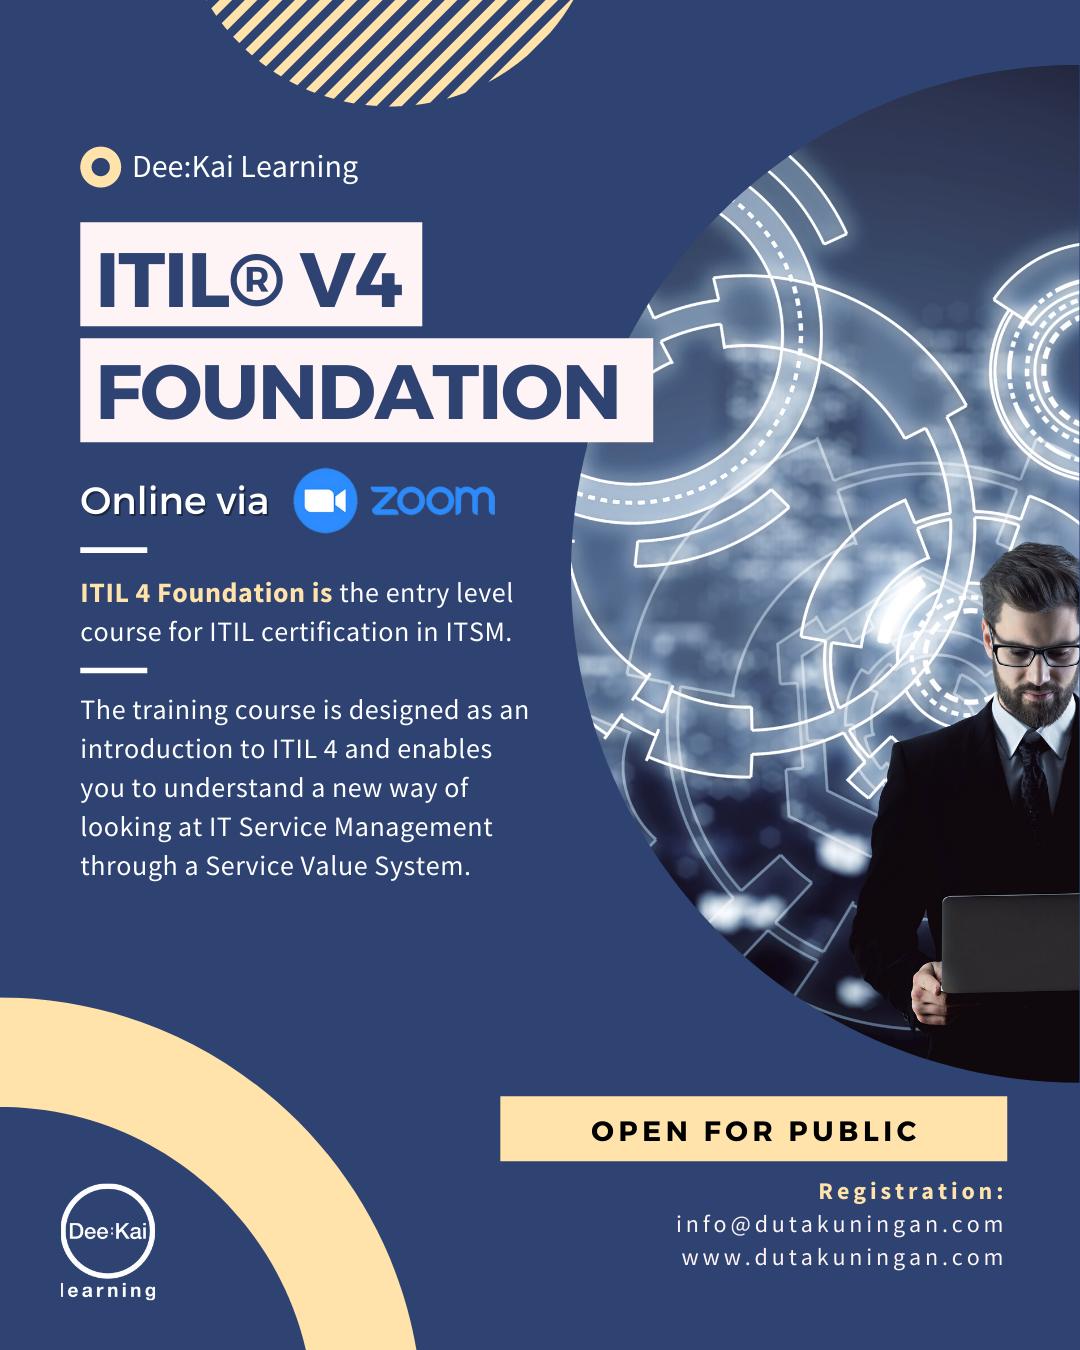 ITIL® v4 FOUNDATION